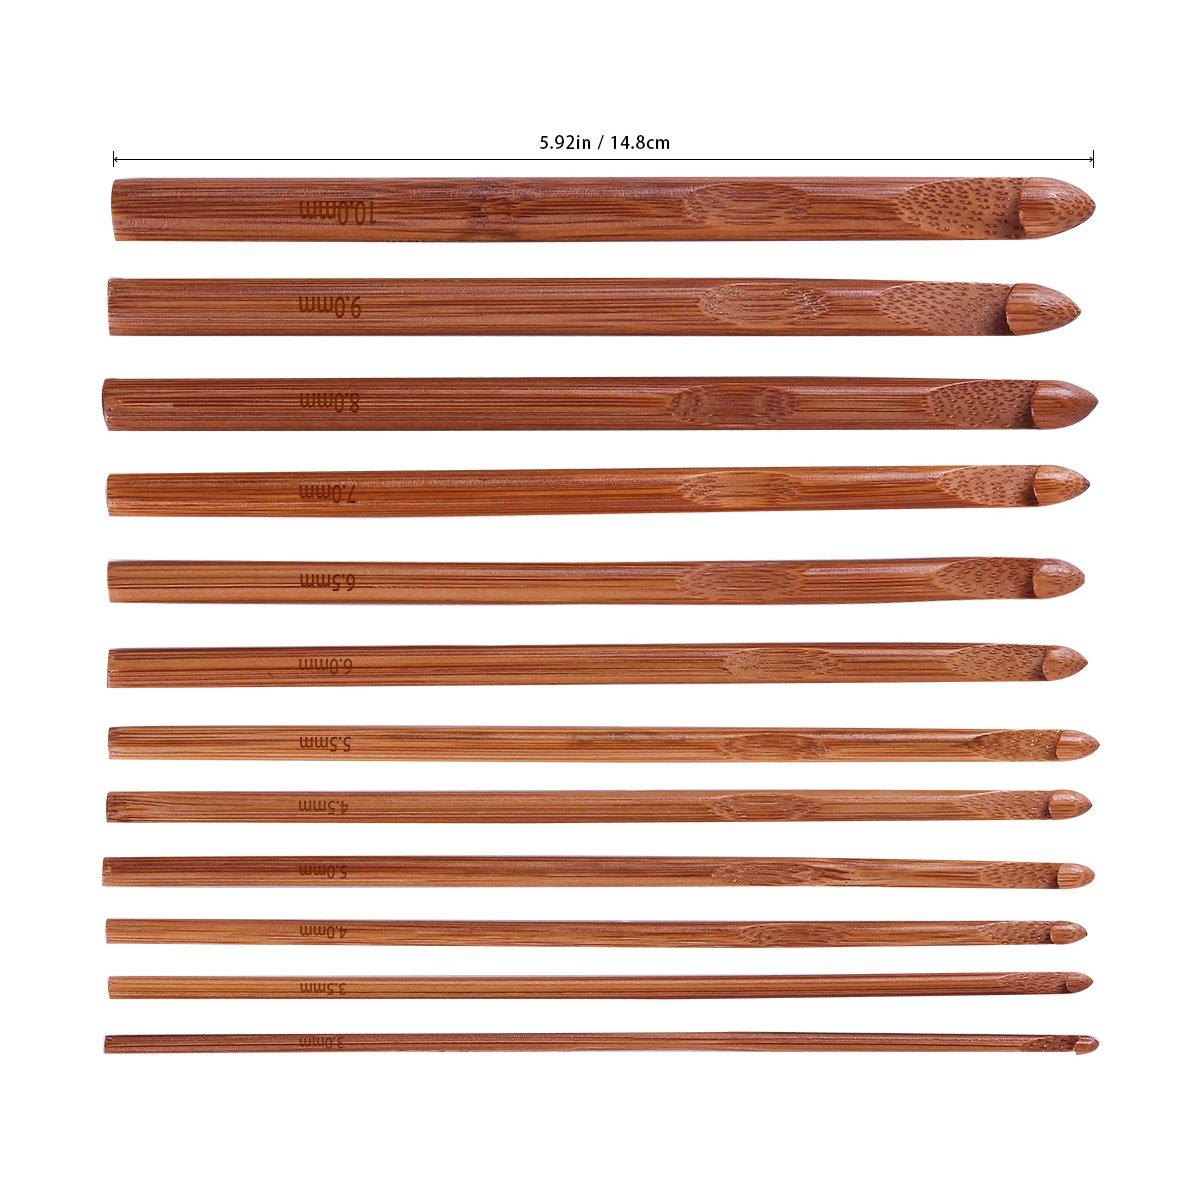 20 Carbonized Bamboo Crochet Hooks, Full Gift Set, Lightweight, Ergonomic, Eco-Friendly, Size C to N, Steel Hook Sizes 1.0-2.75MM by KOKNIT (Image #4)